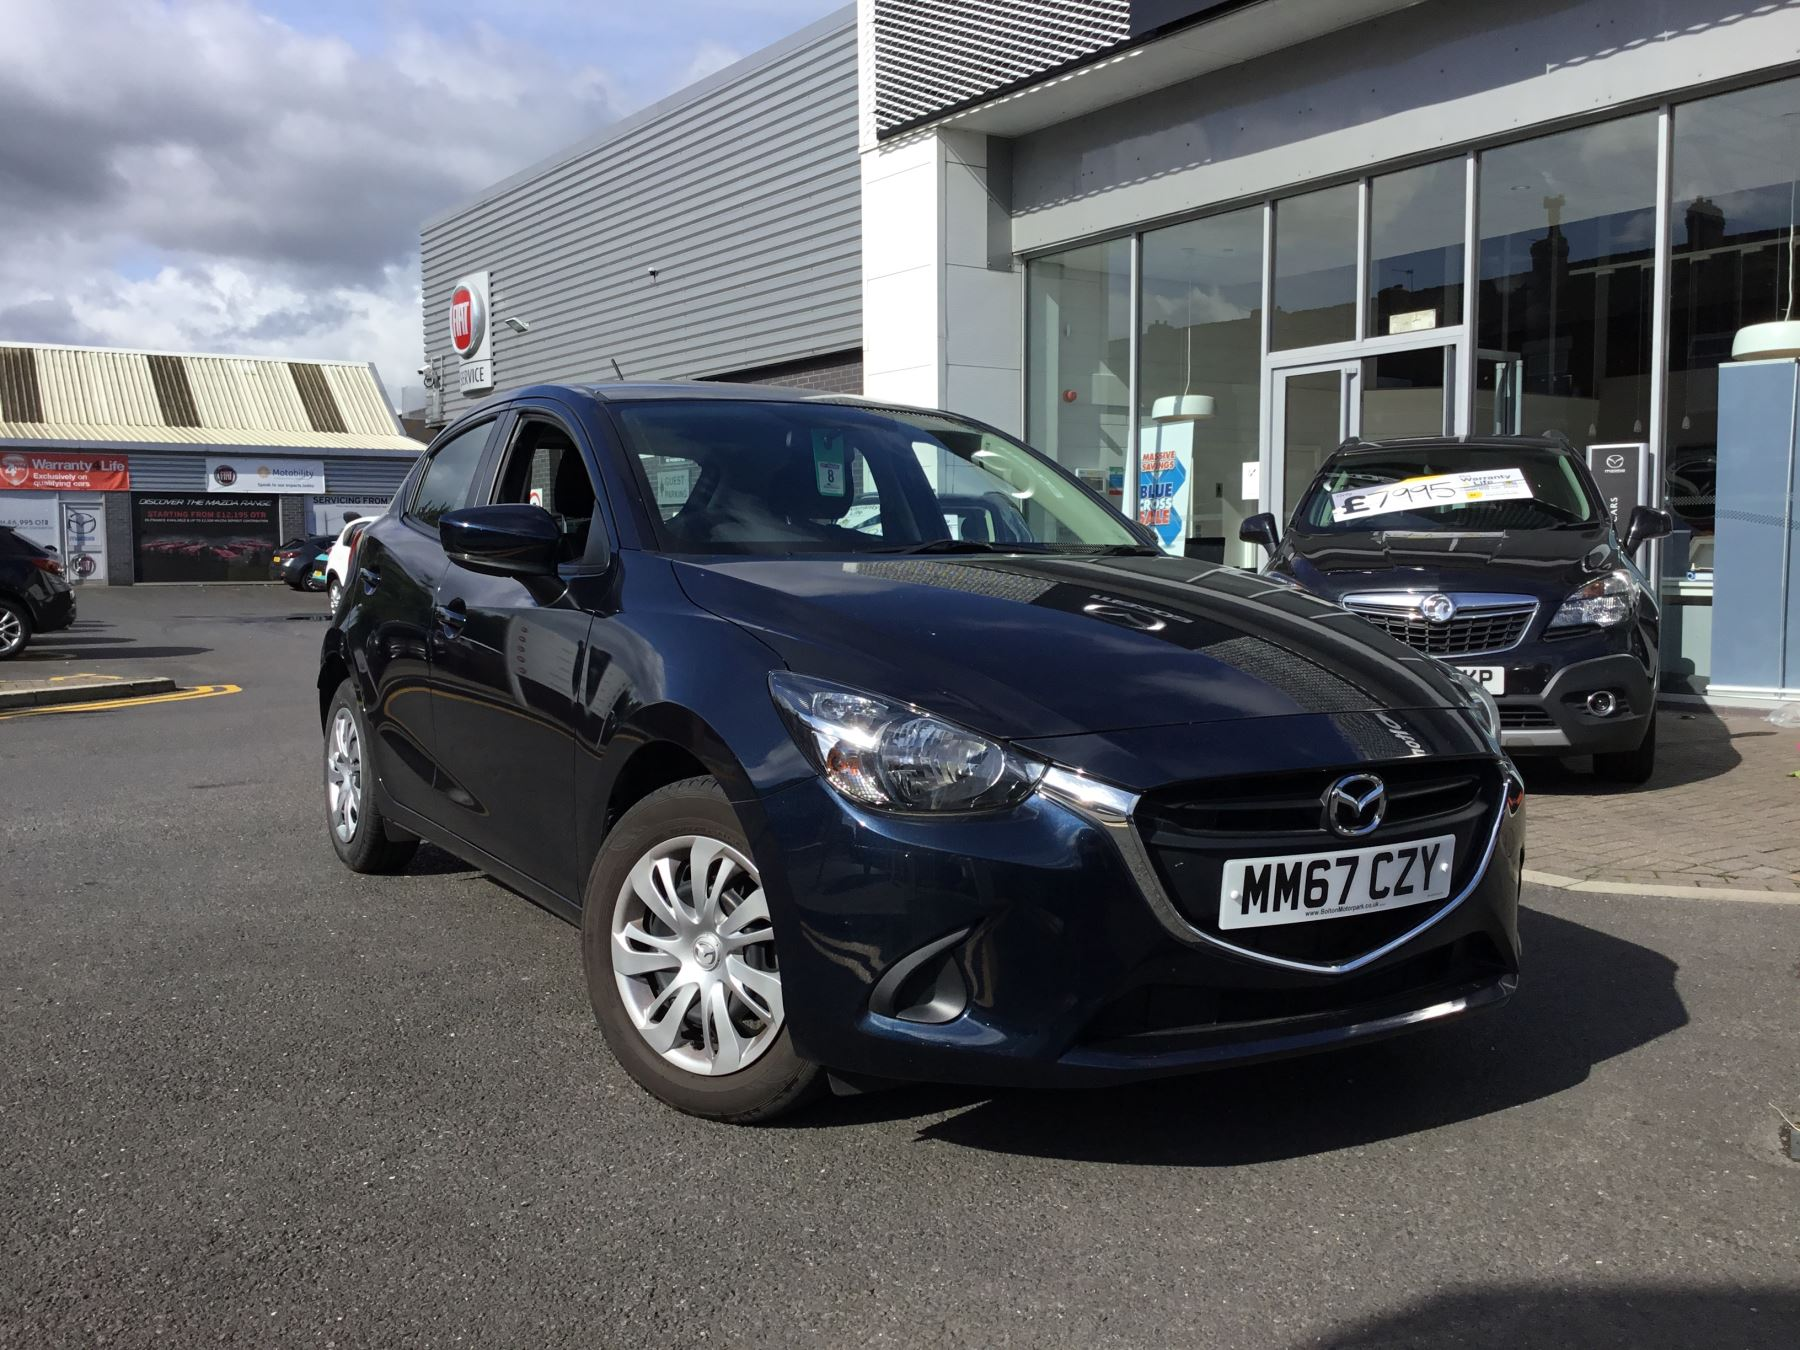 Mazda 2 1.5 75 SE 5dr image 1